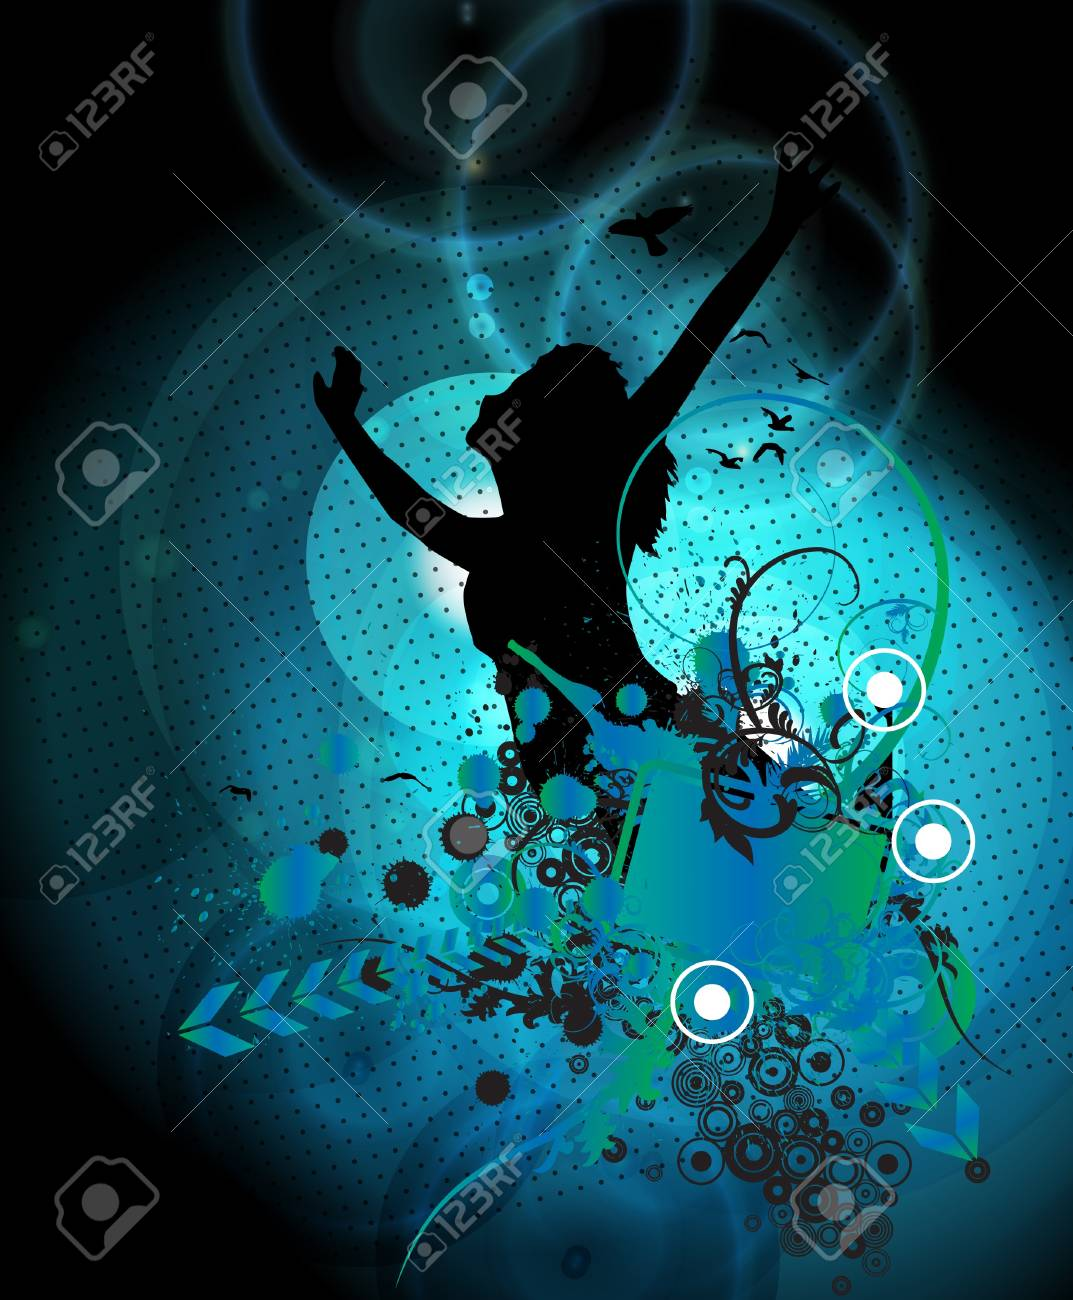 Music background illustration Stock Vector - 13294492